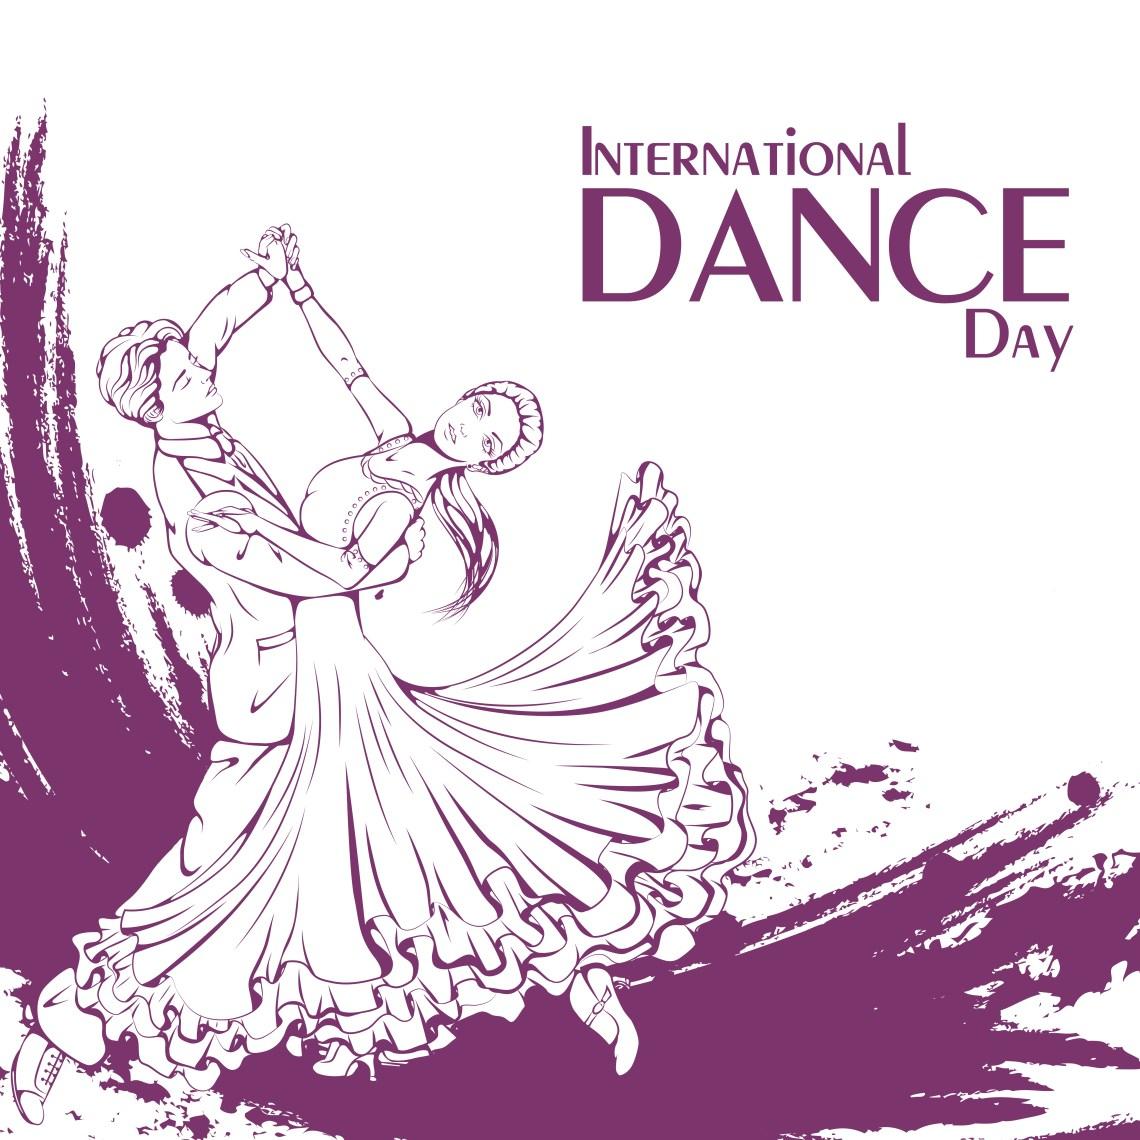 International Dance Day poster.